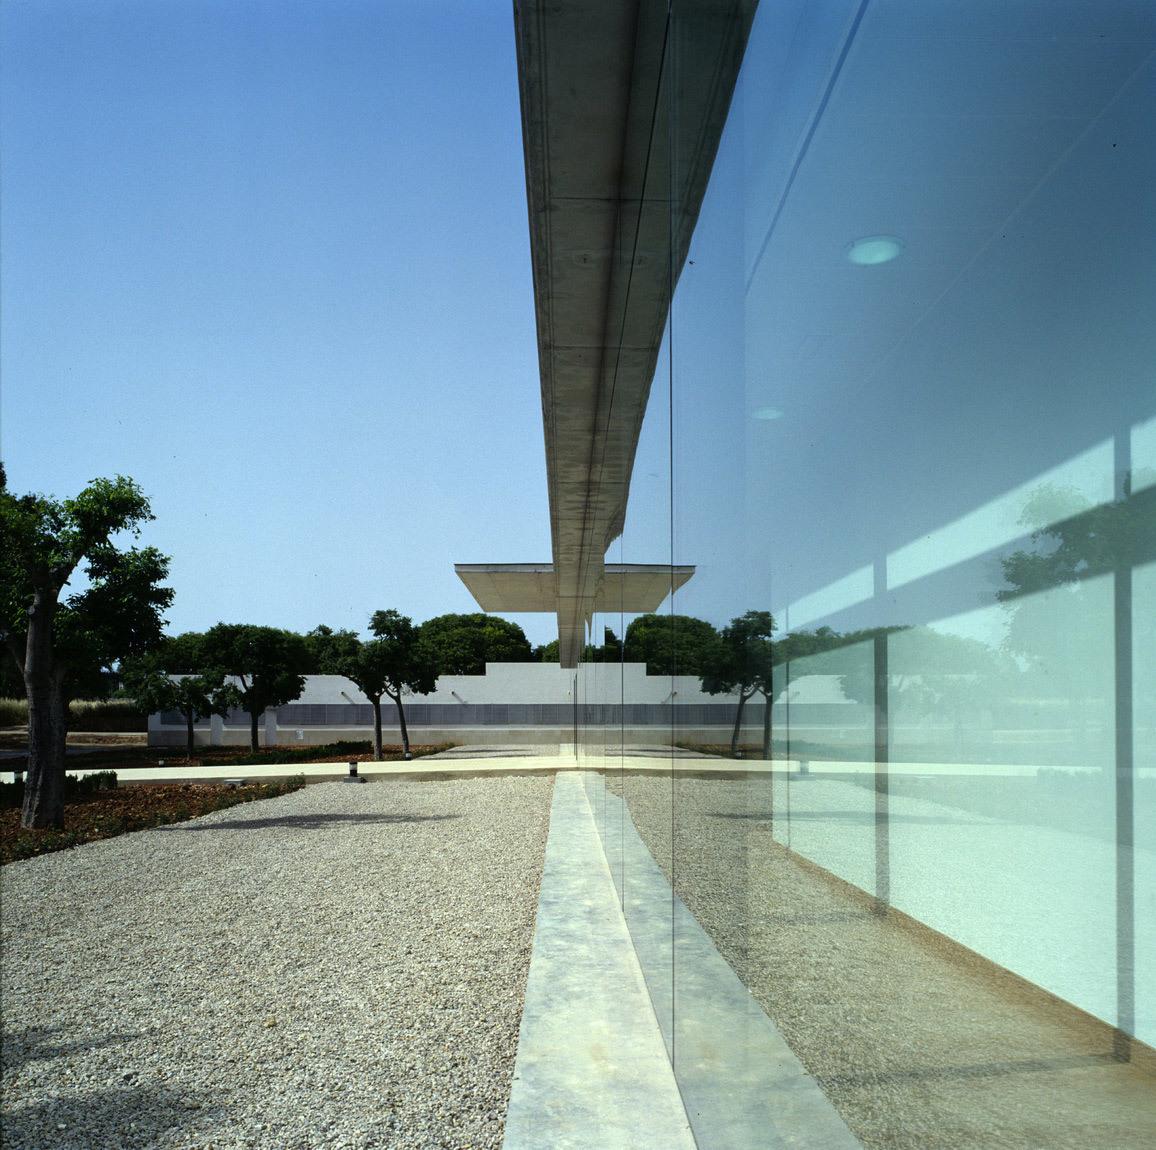 Hospital in Palma de Mallorca, Spain by CMV Architects